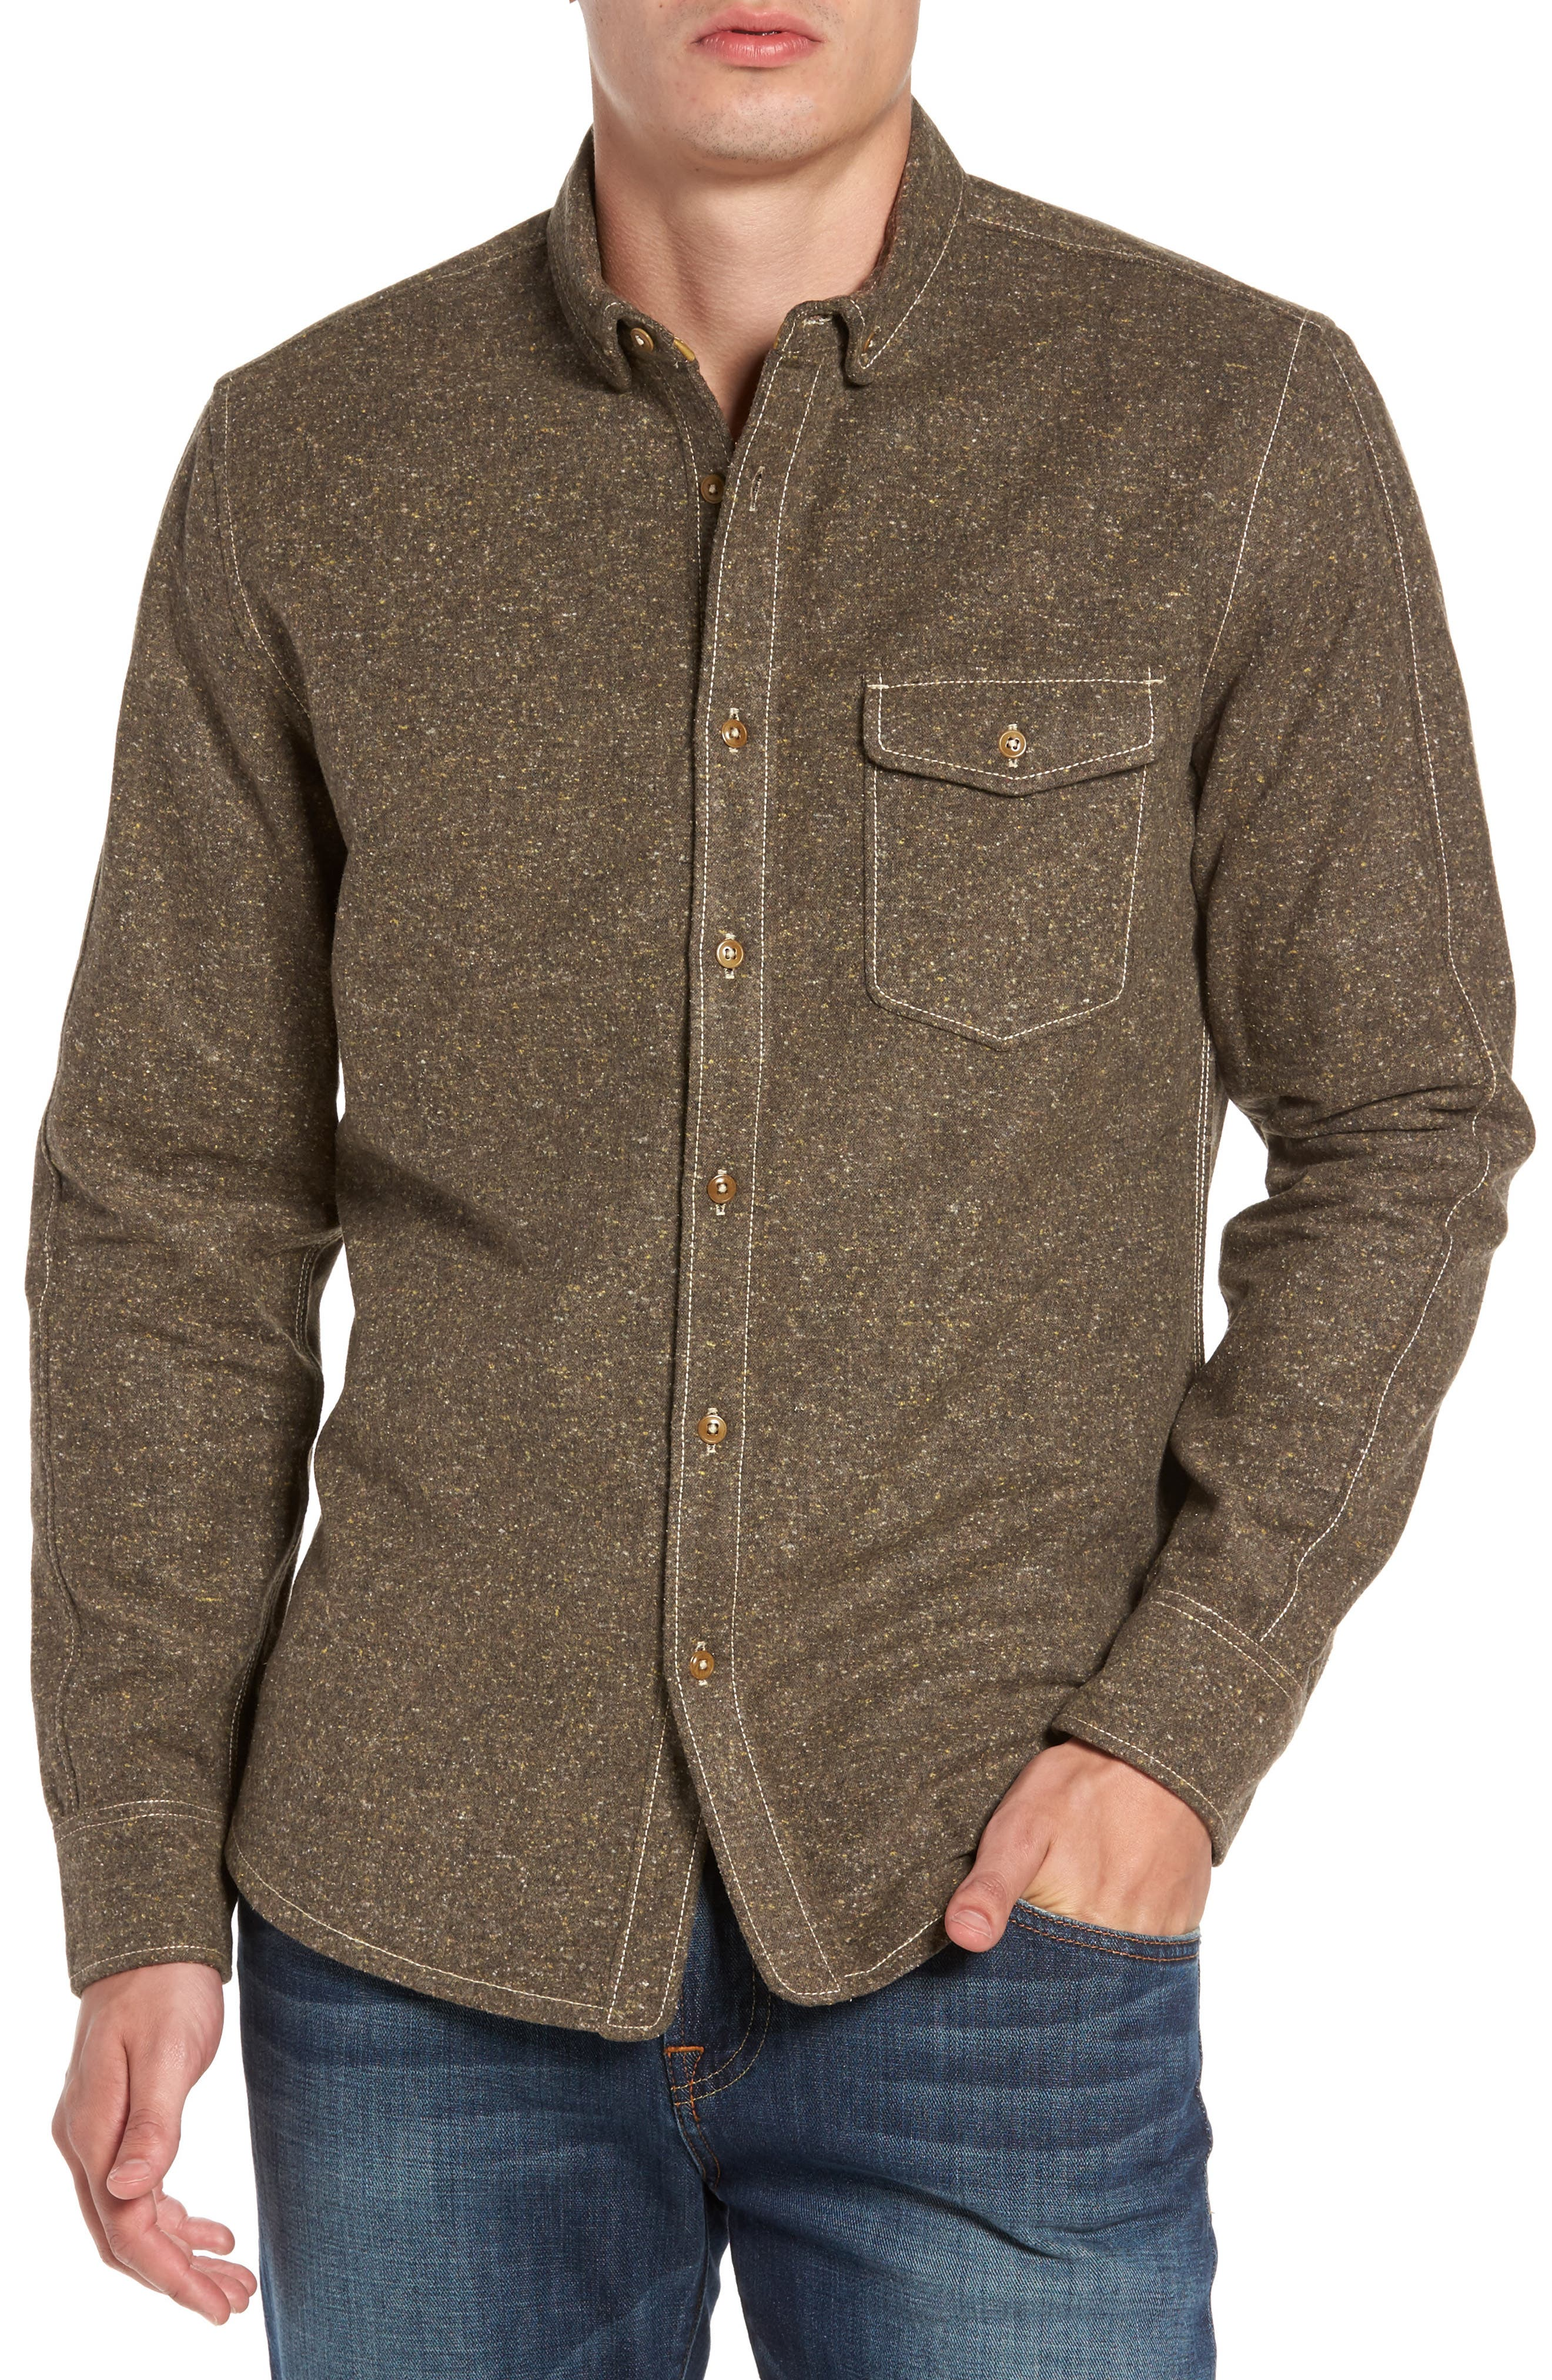 Jeremiah Utah Nep Heather Flannel Shirt, Brown